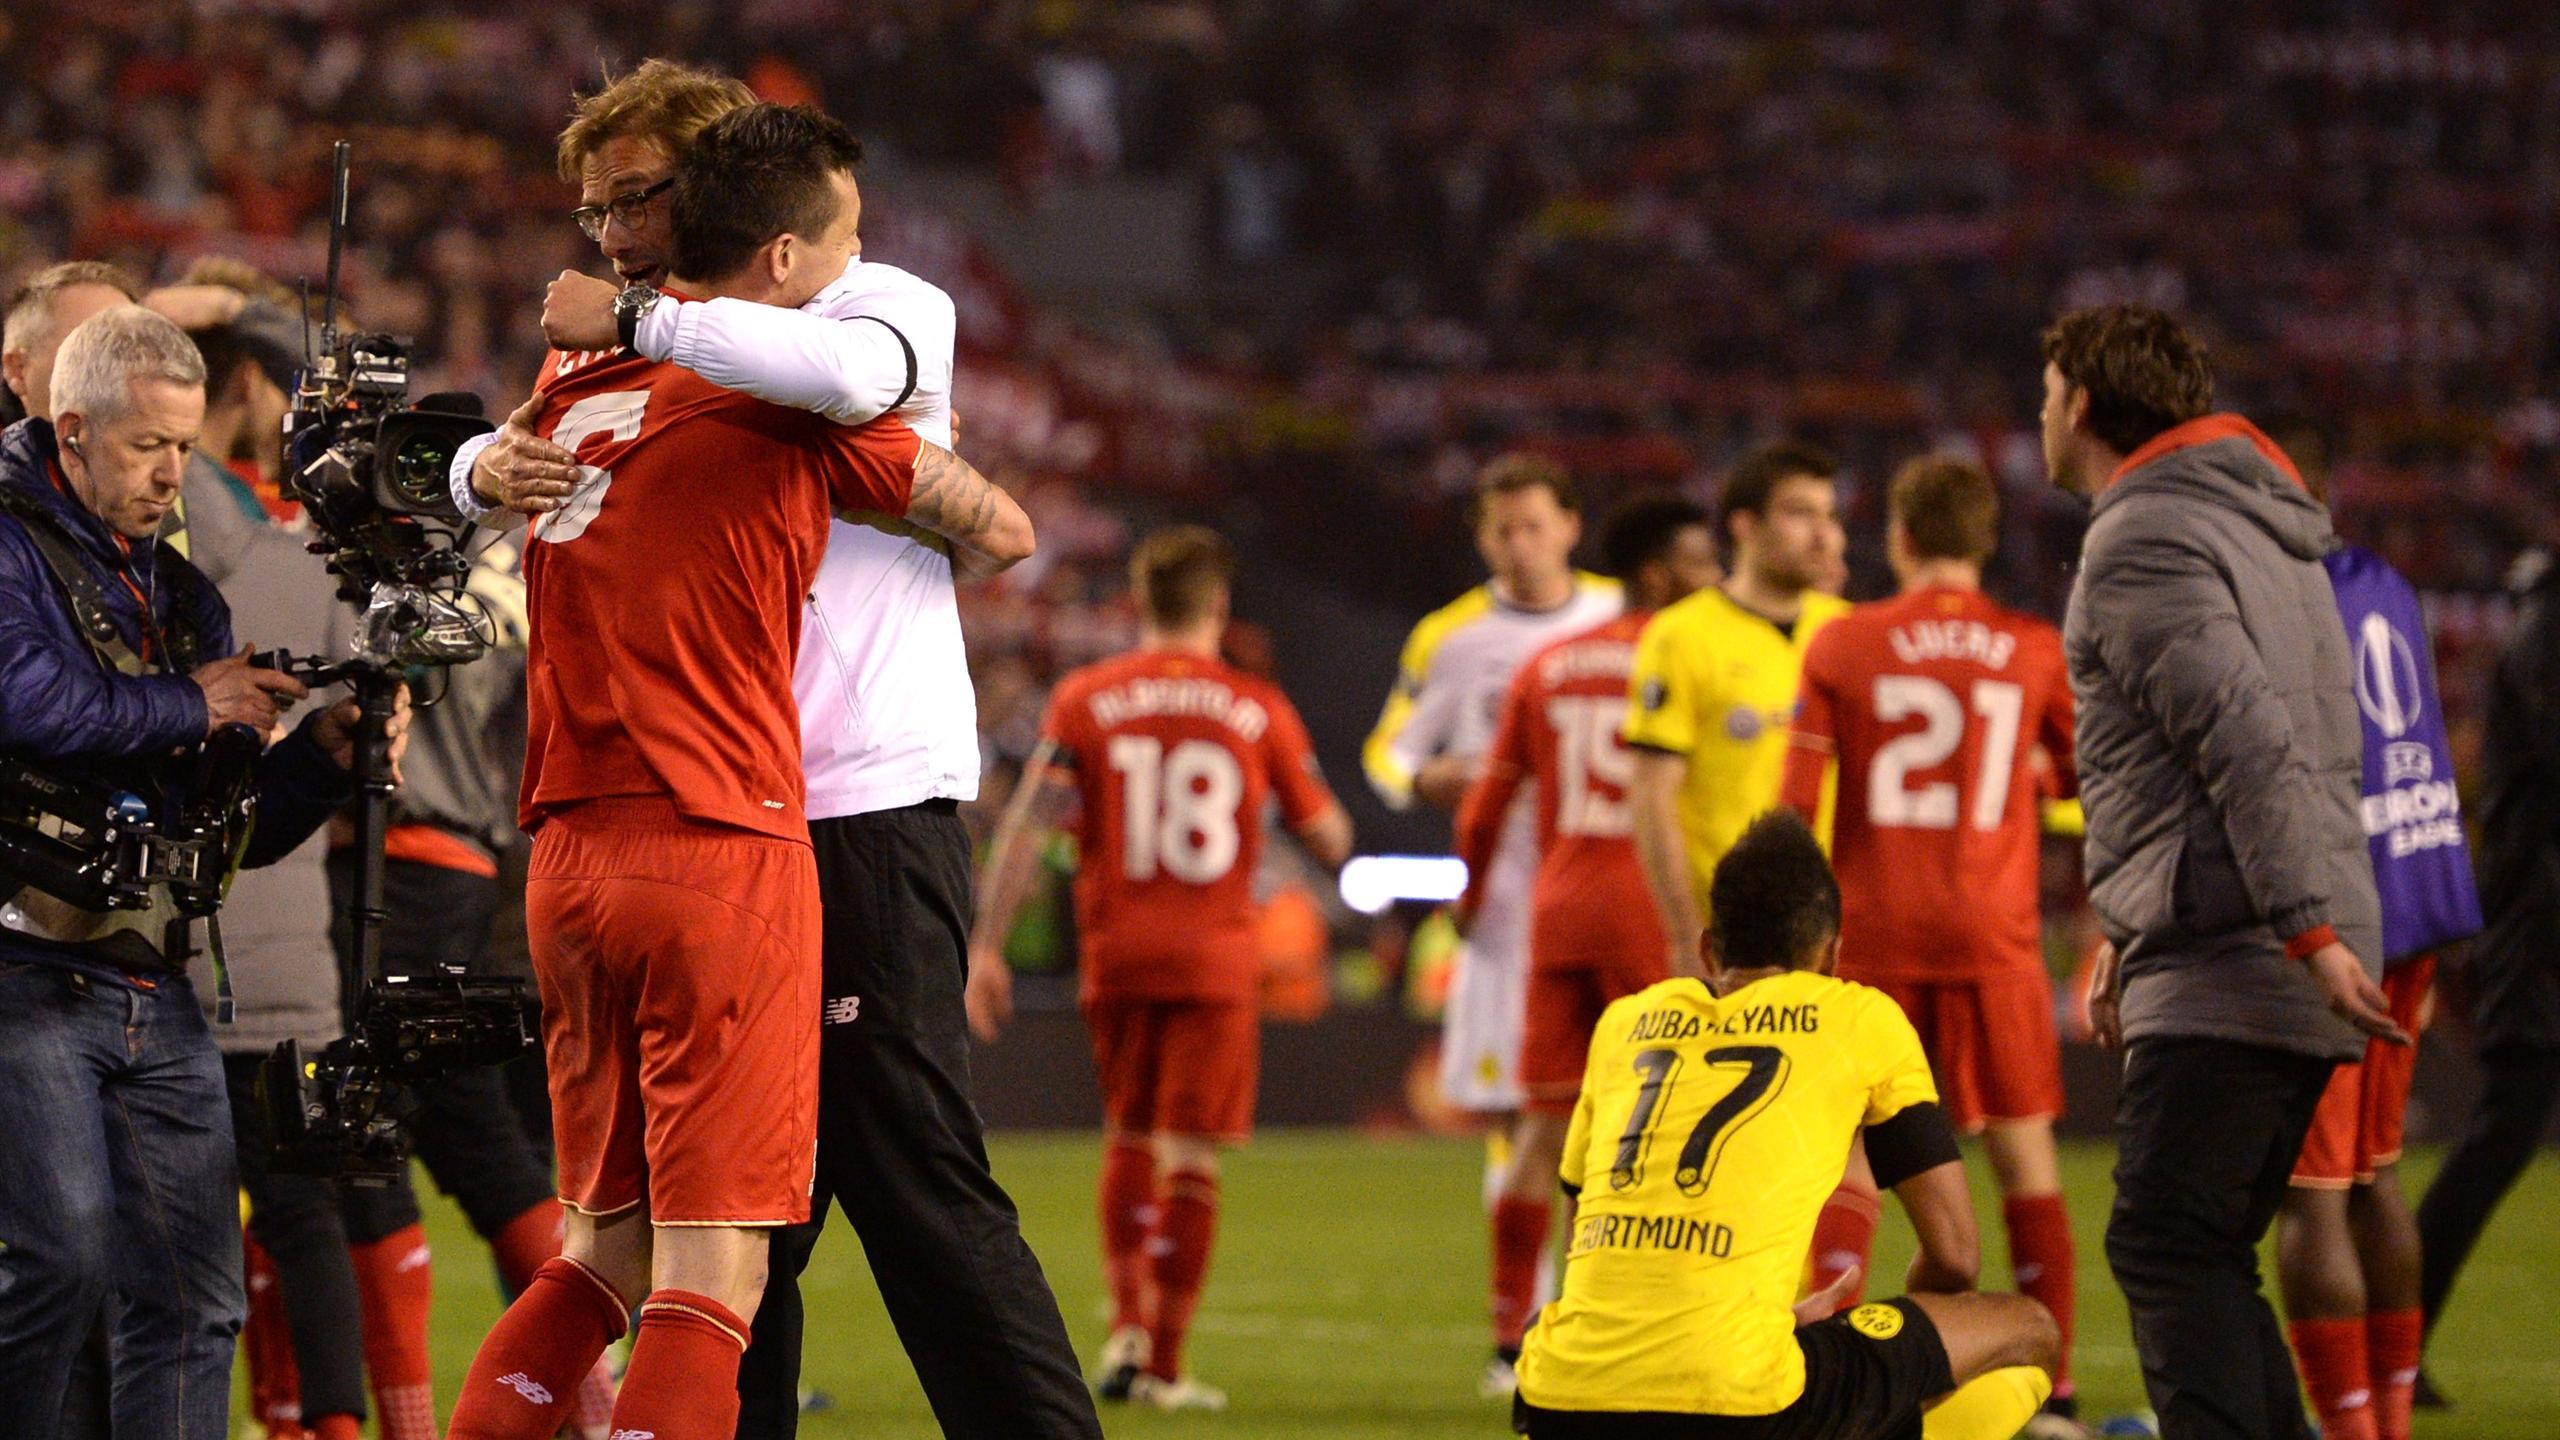 Jurgen Klopp celevrates with his Liverpool players